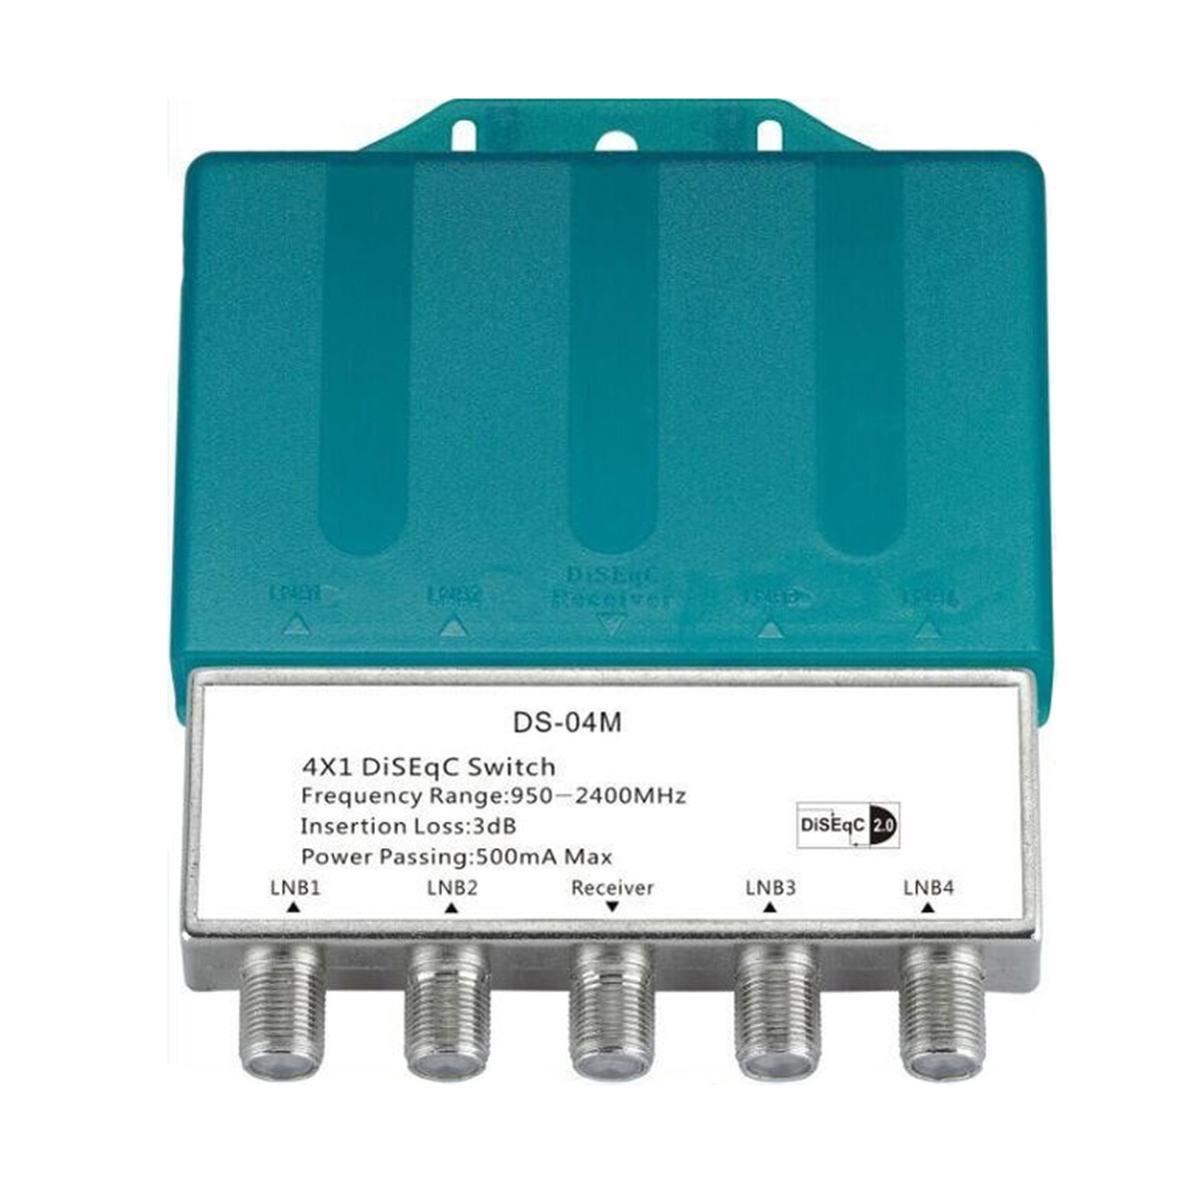 LEORY DS-04M 4x1 DiSEqC 2,0 4 en 1 con interruptor de cubierta de lluvia satélite LNBF Dish Multiswitch para receptor FTA